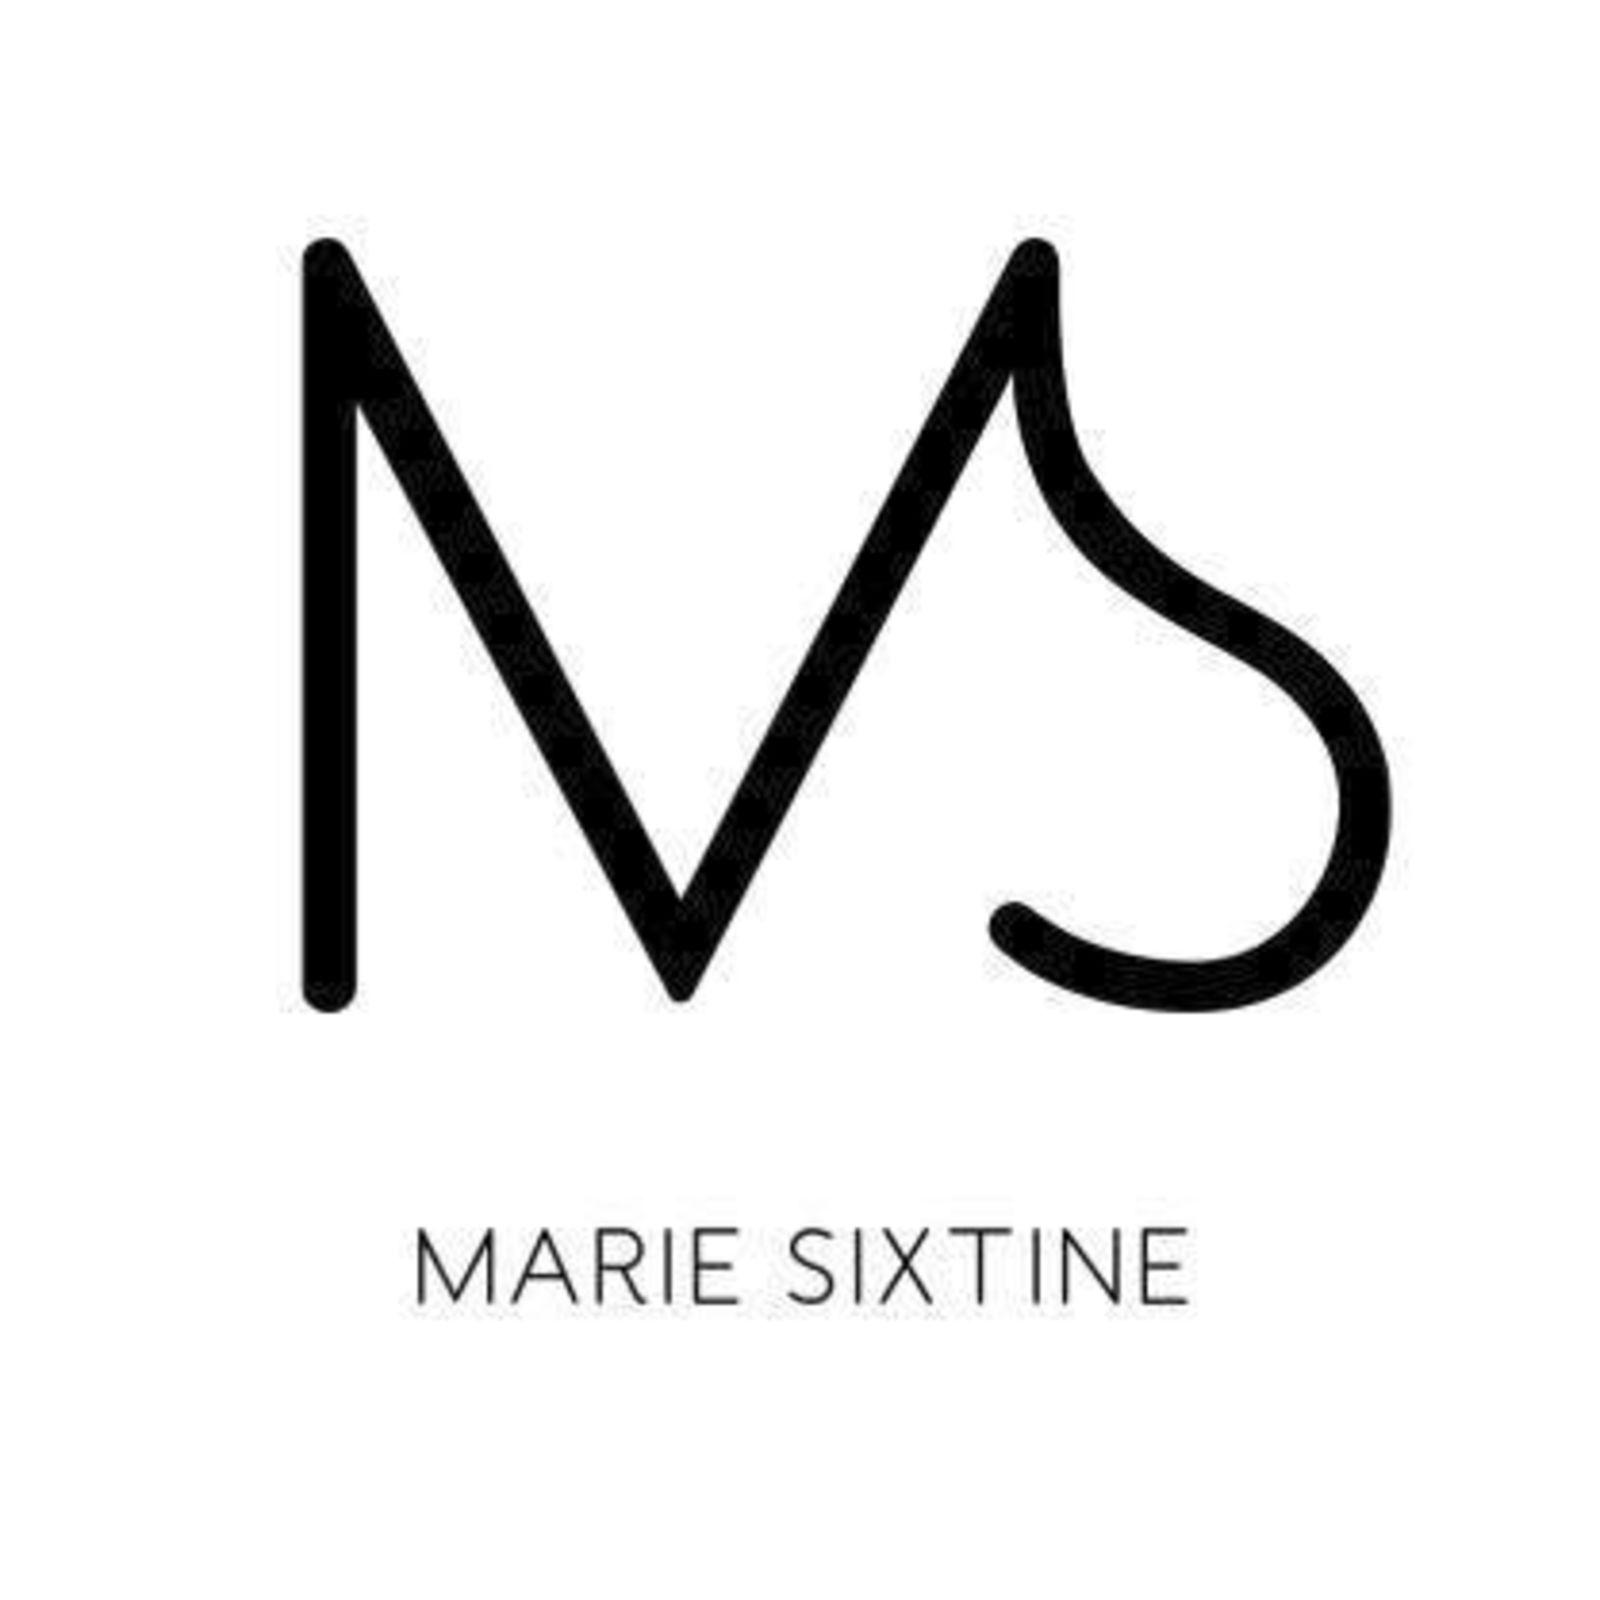 Marie Sixtine